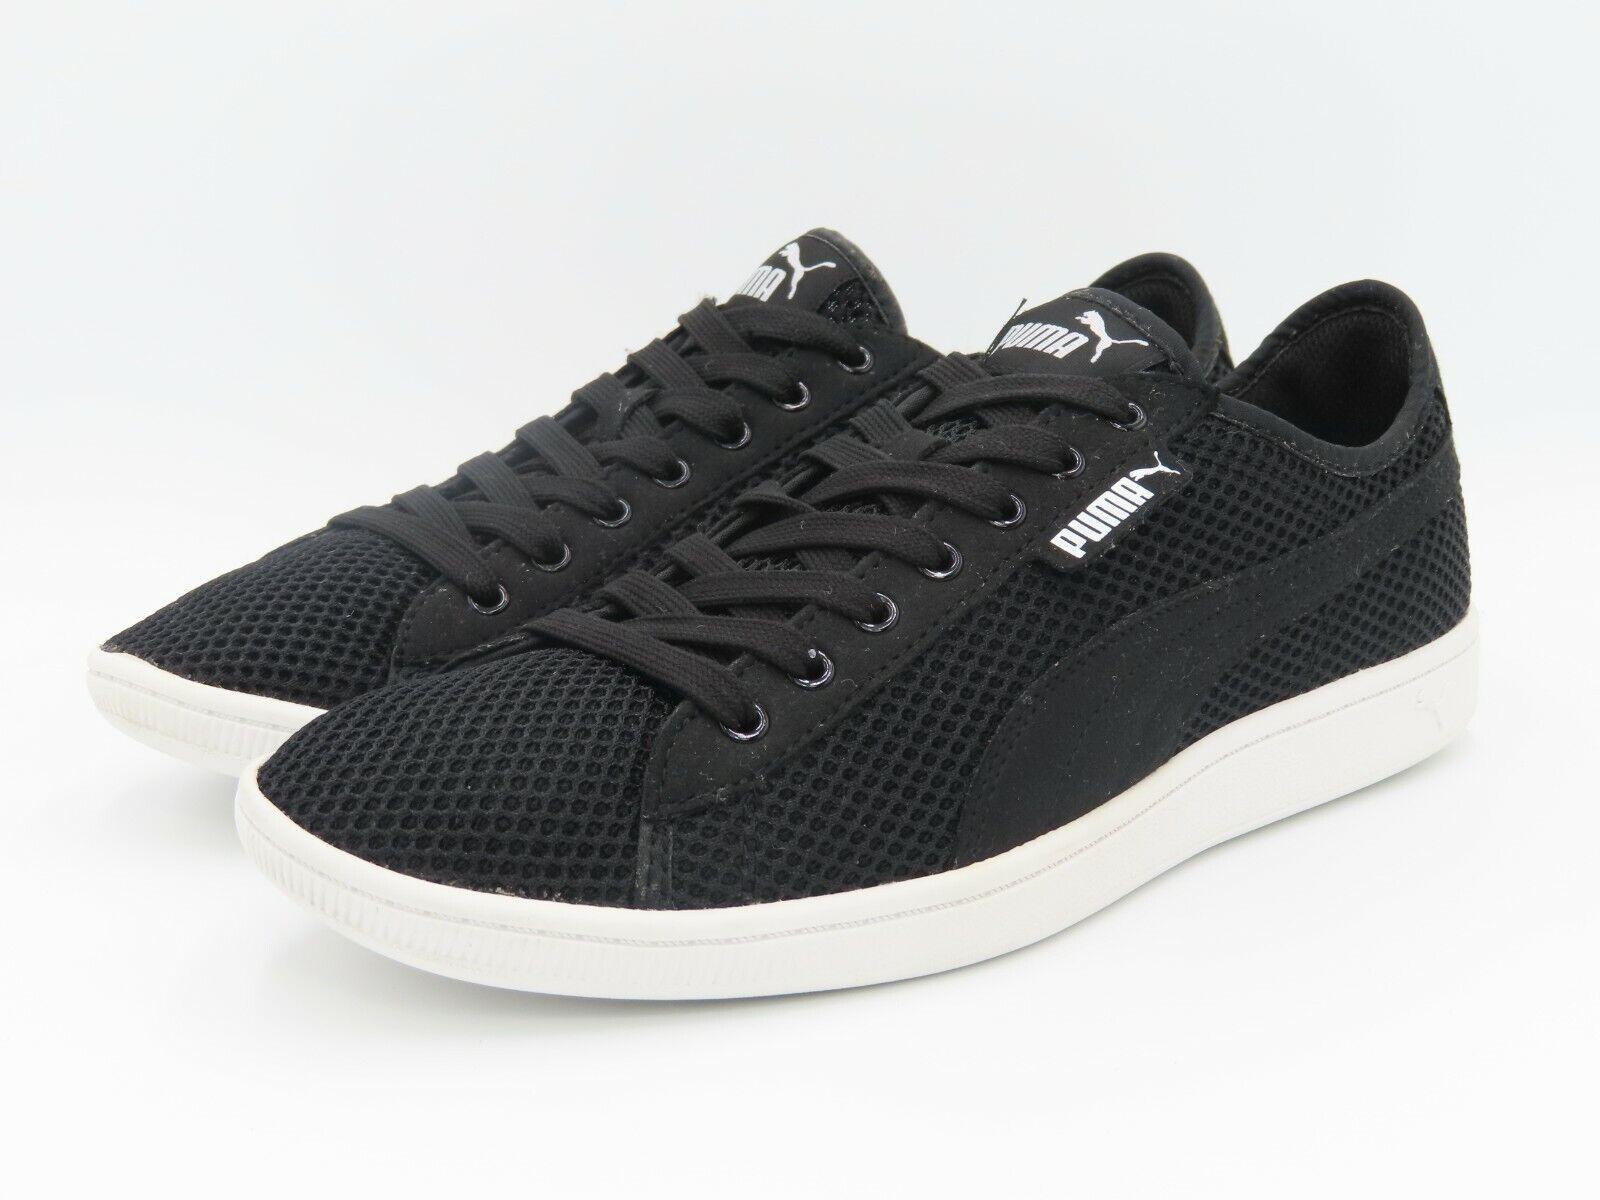 PUMA Vikky Mesh Women's Sneakers Shoes